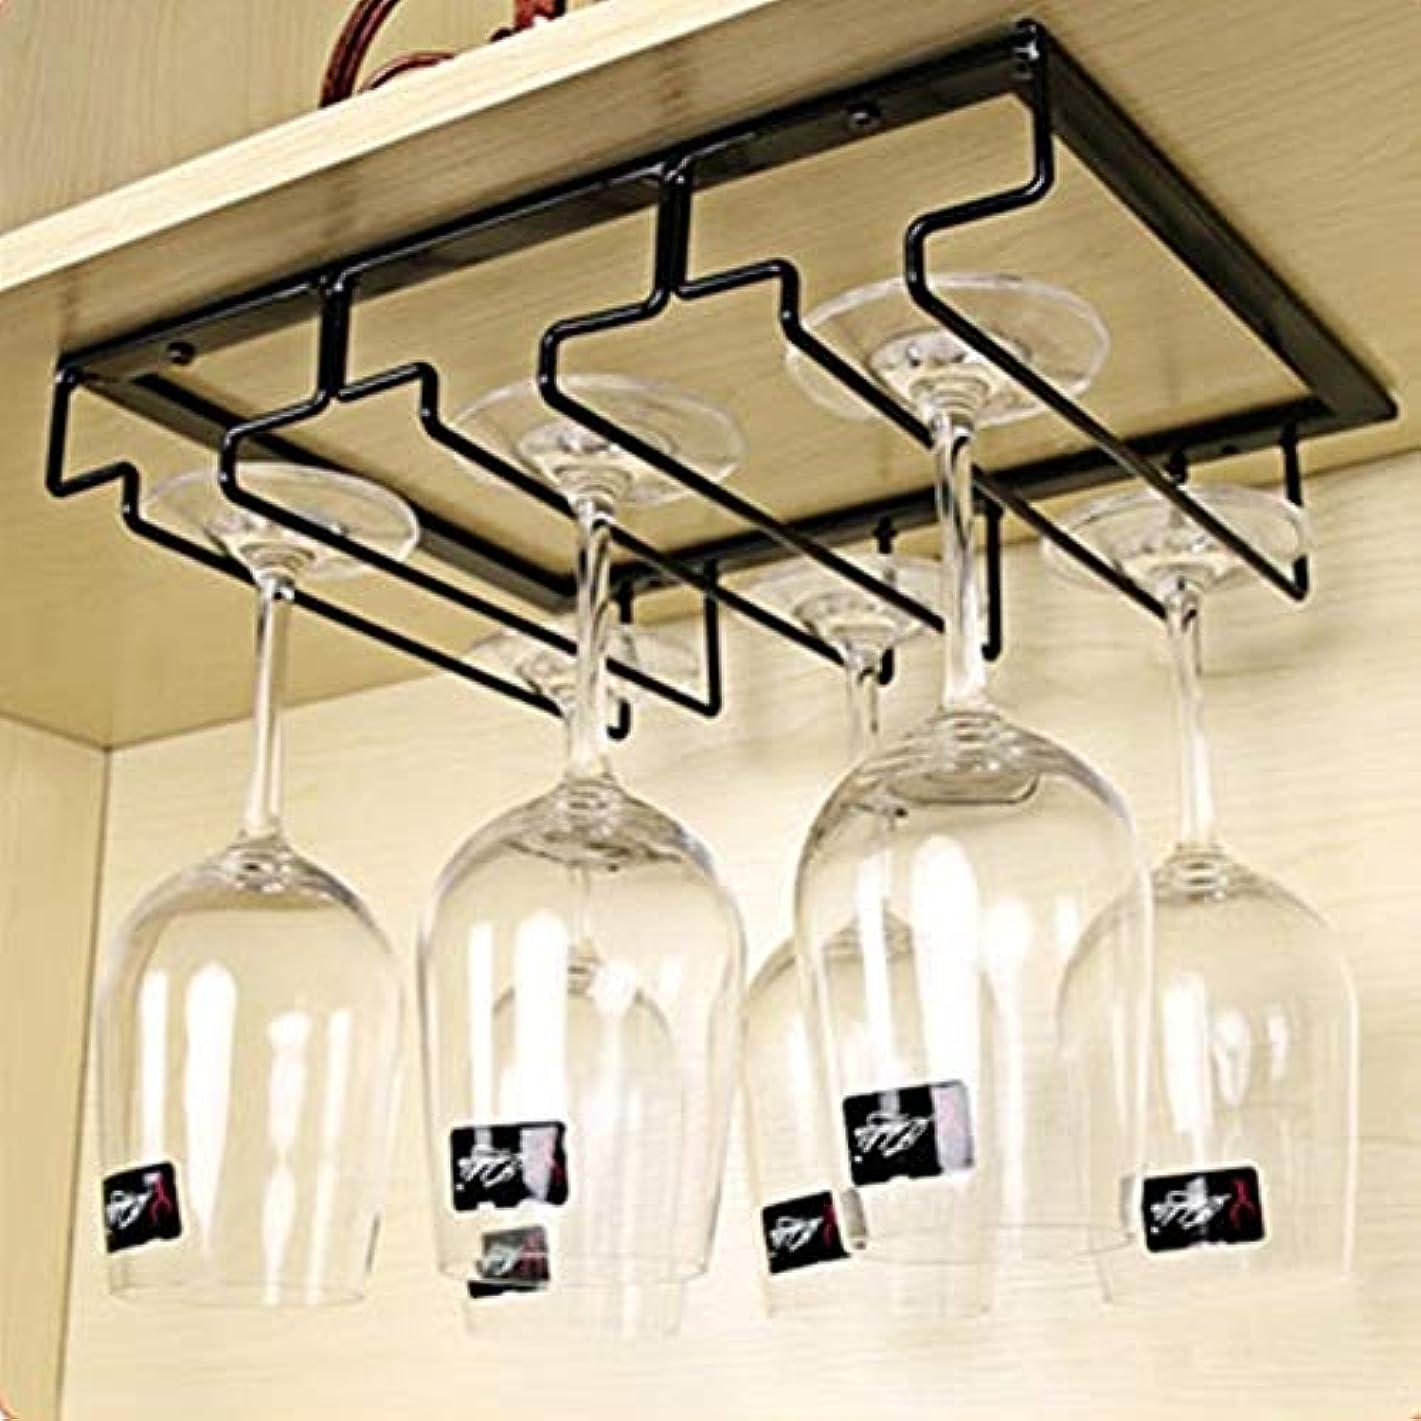 Wine Glass Rack Under Cabinet,Stemware Wine Glass Holder Glasses Storage Hanger Metal Organizer,Glassware Champagne Glass Rack,Freestanding Wine Cup Display Stand(1pc,3 Rows)